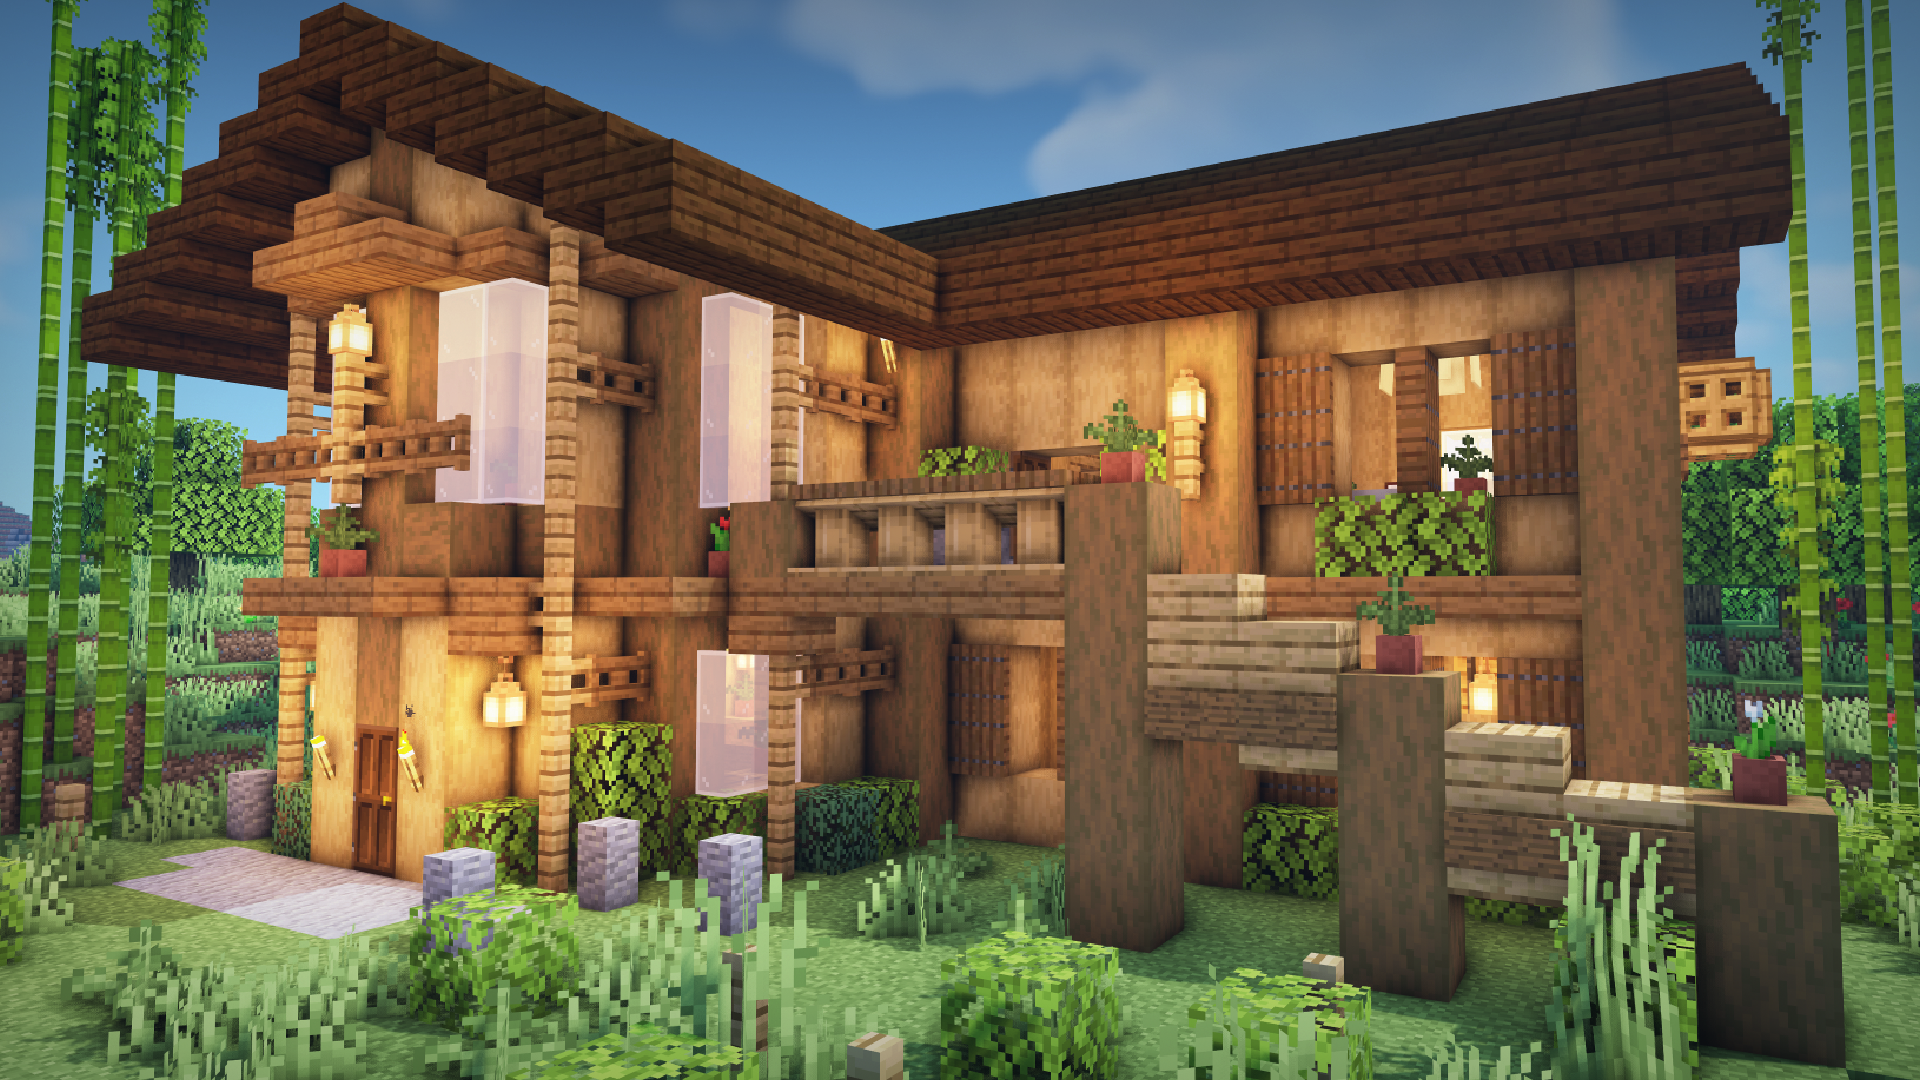 Minecraft: How To Build a Wooden Modern House - goukko.com